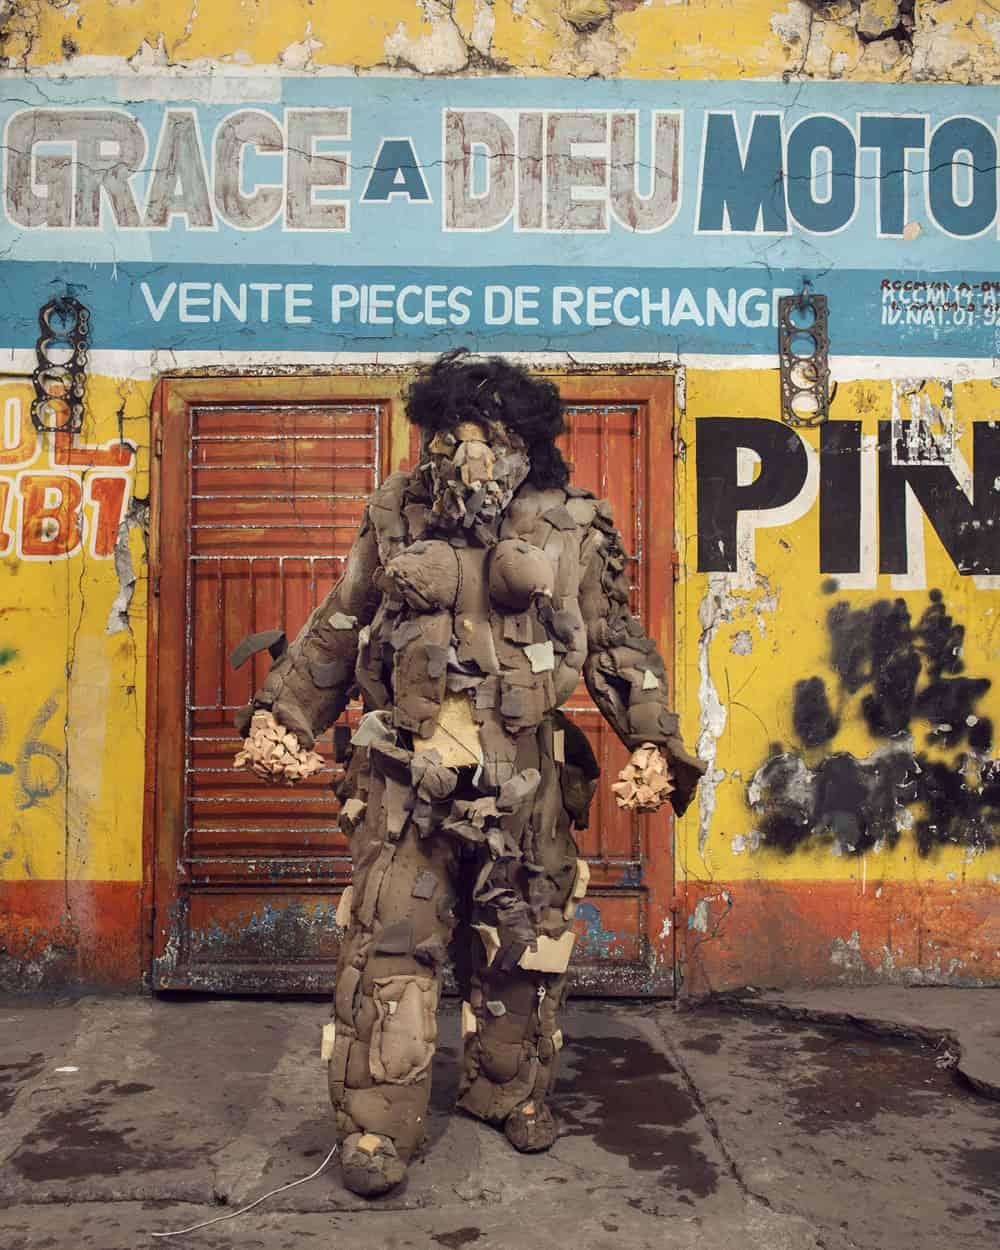 Untitled #16, 2020 Homo Detritus, Real Portraitik #5 Kinshasa, RDC ©Stephan Gladieu